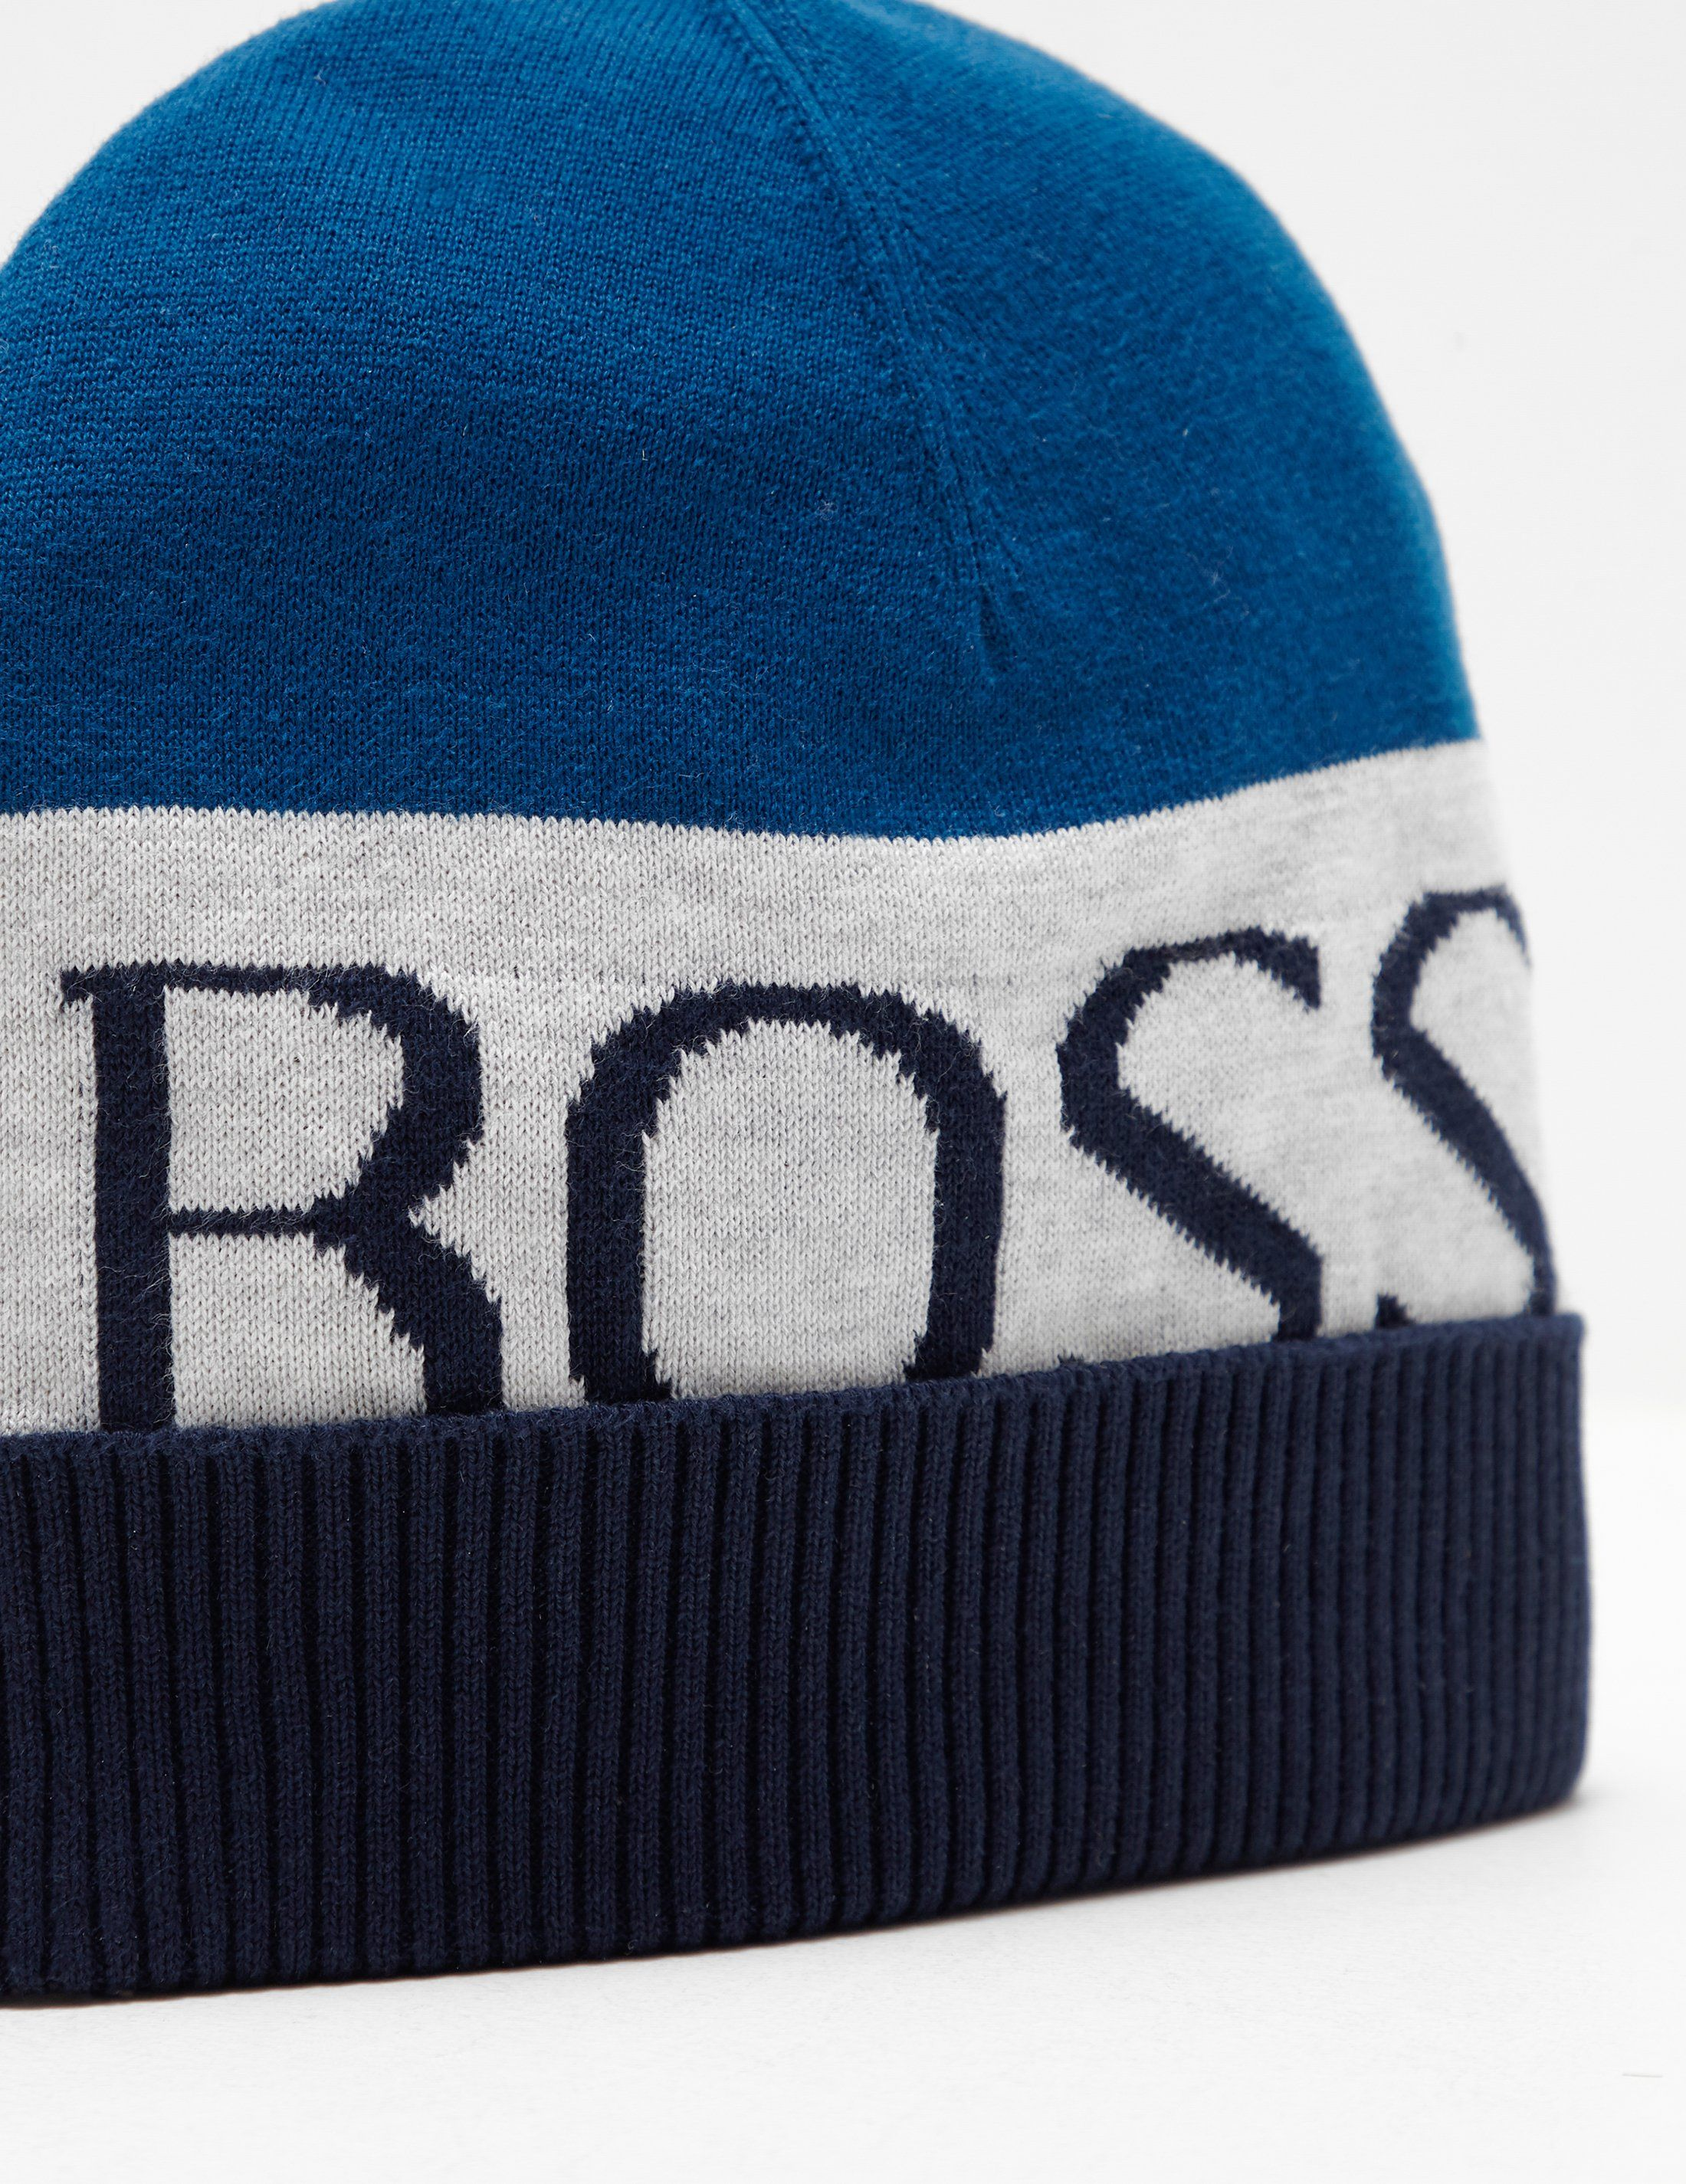 BOSS Logo Beanie - Online Exclusive